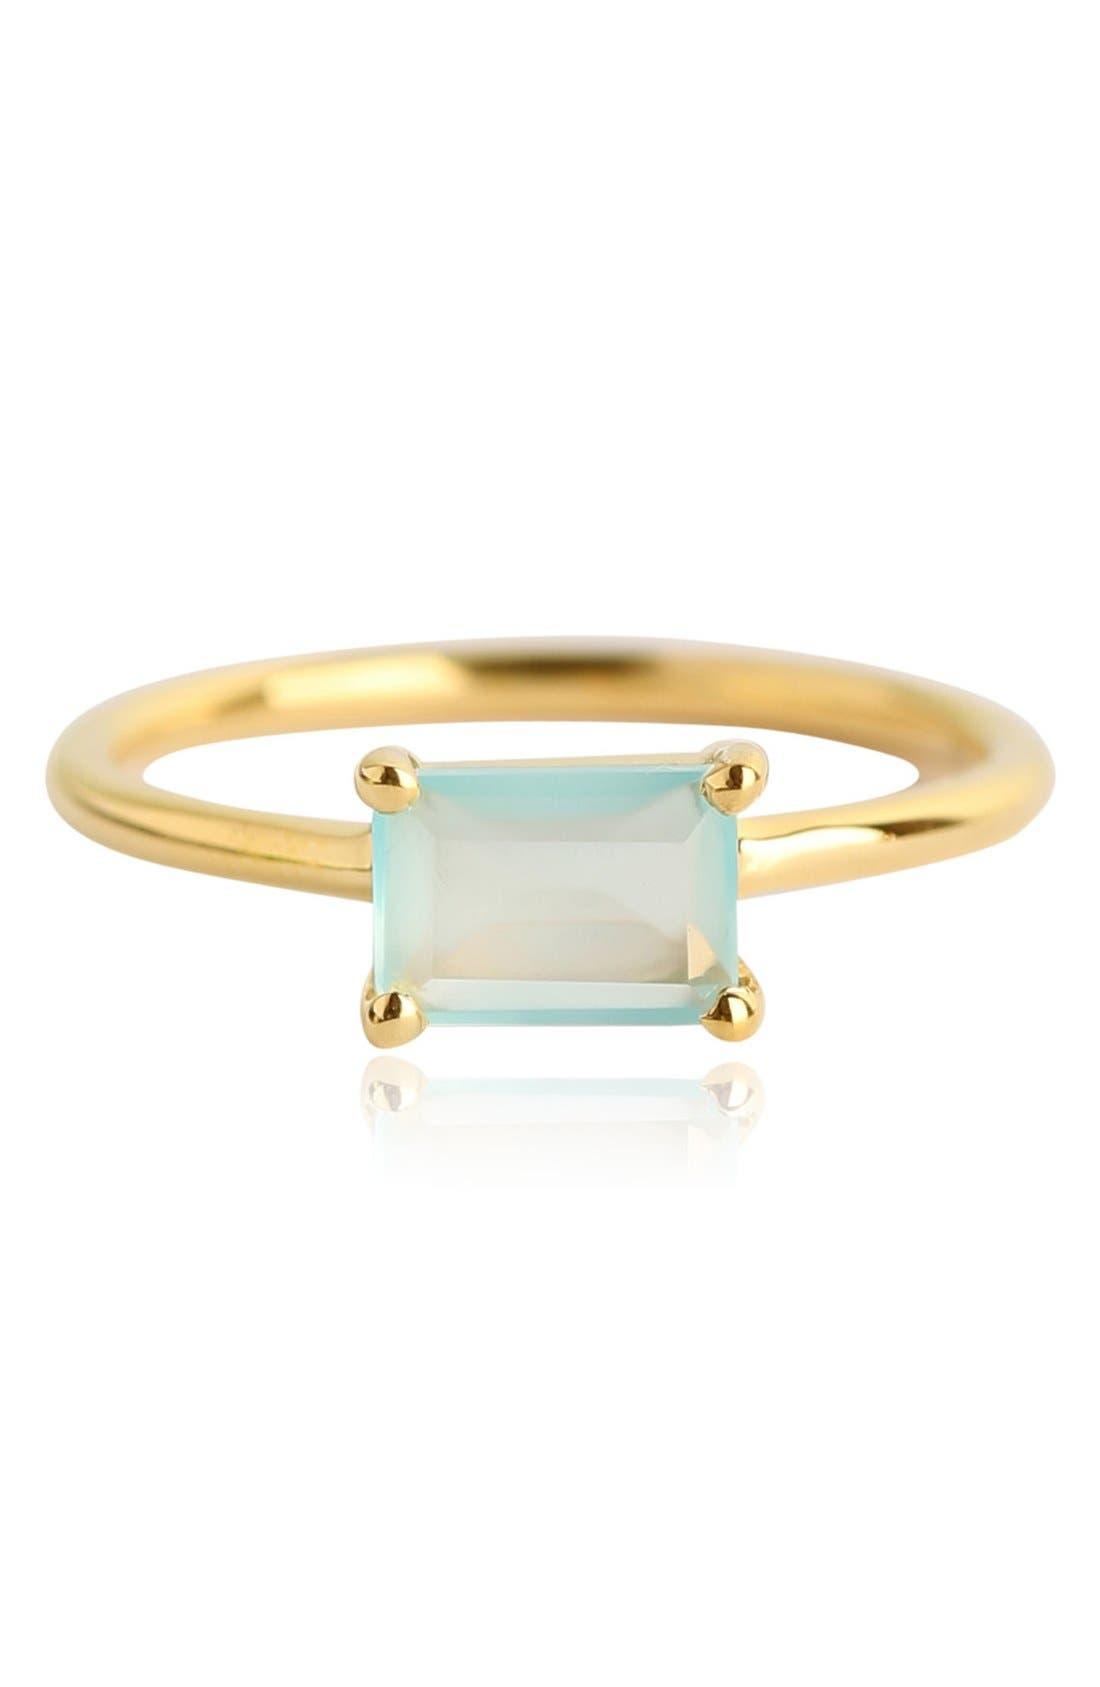 Main Image - Leah Alexandra Baguette Stone Ring